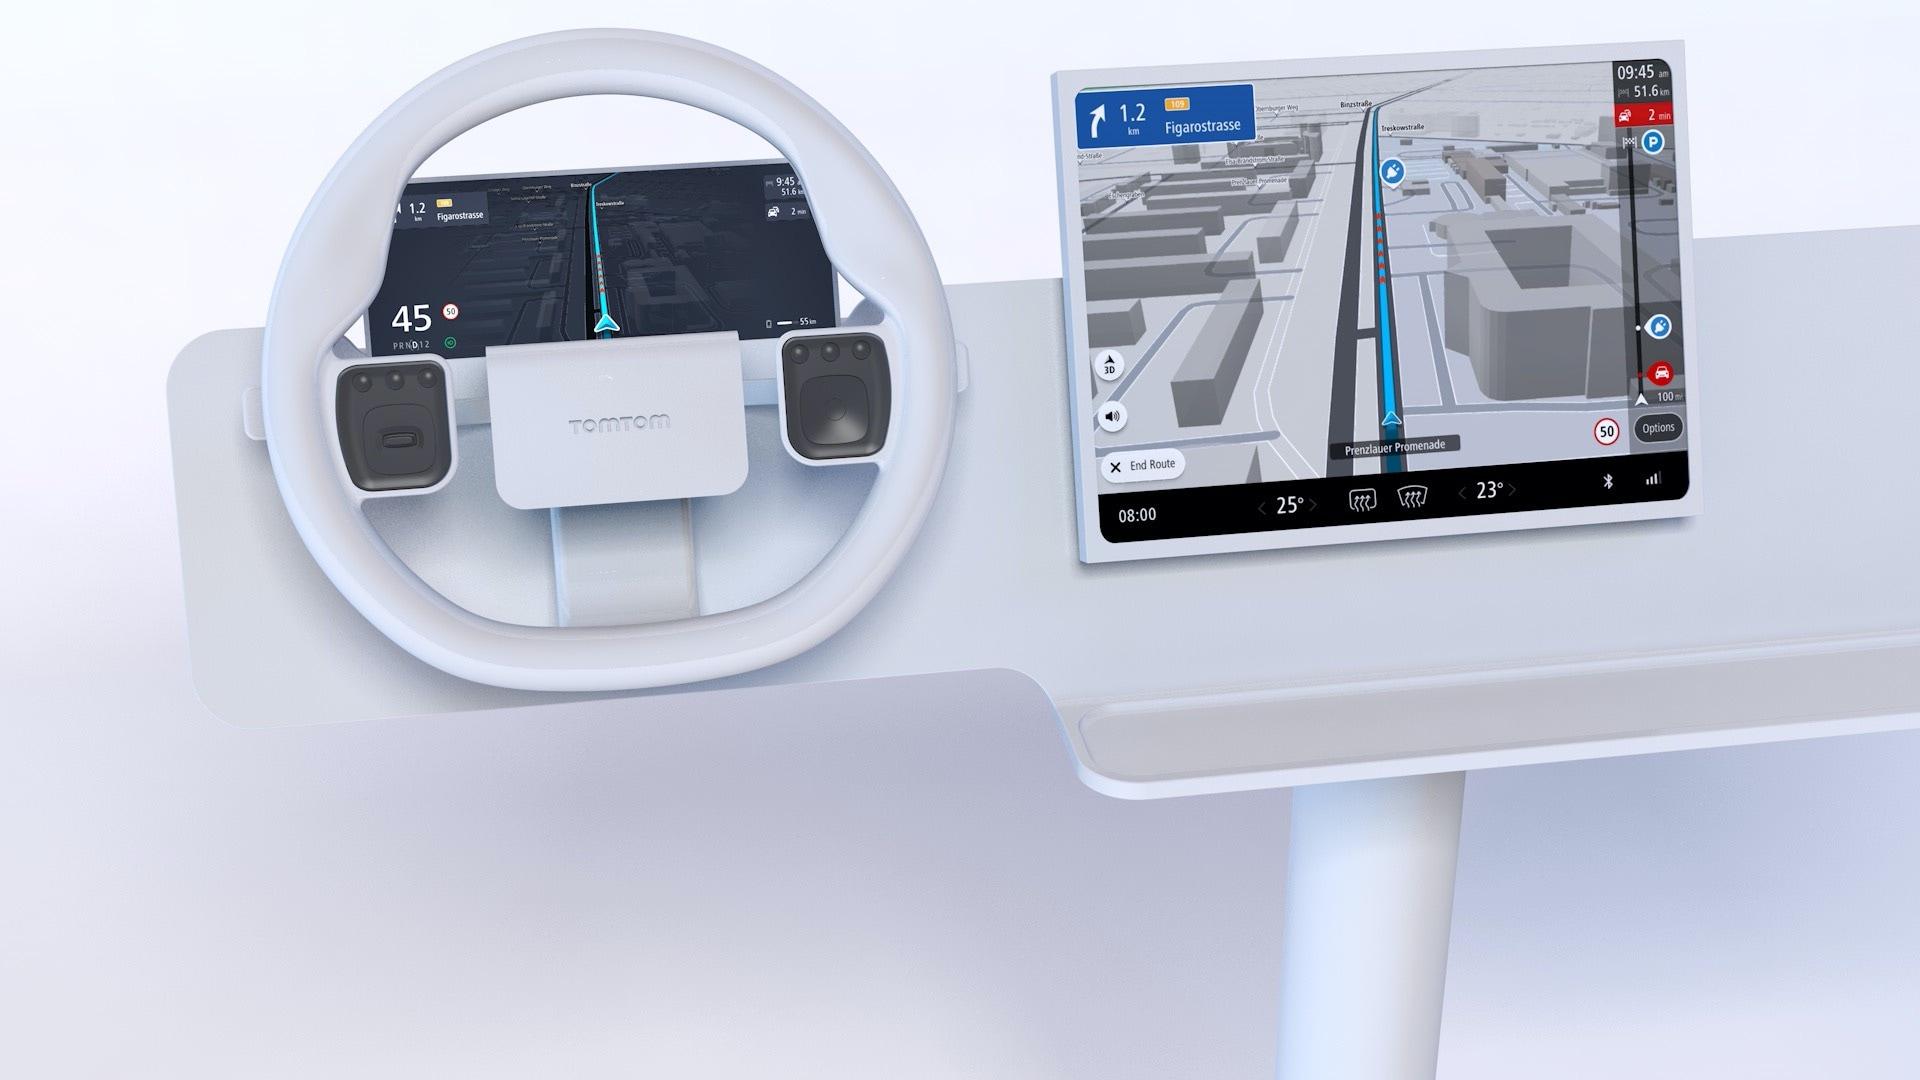 In-dash navigation software